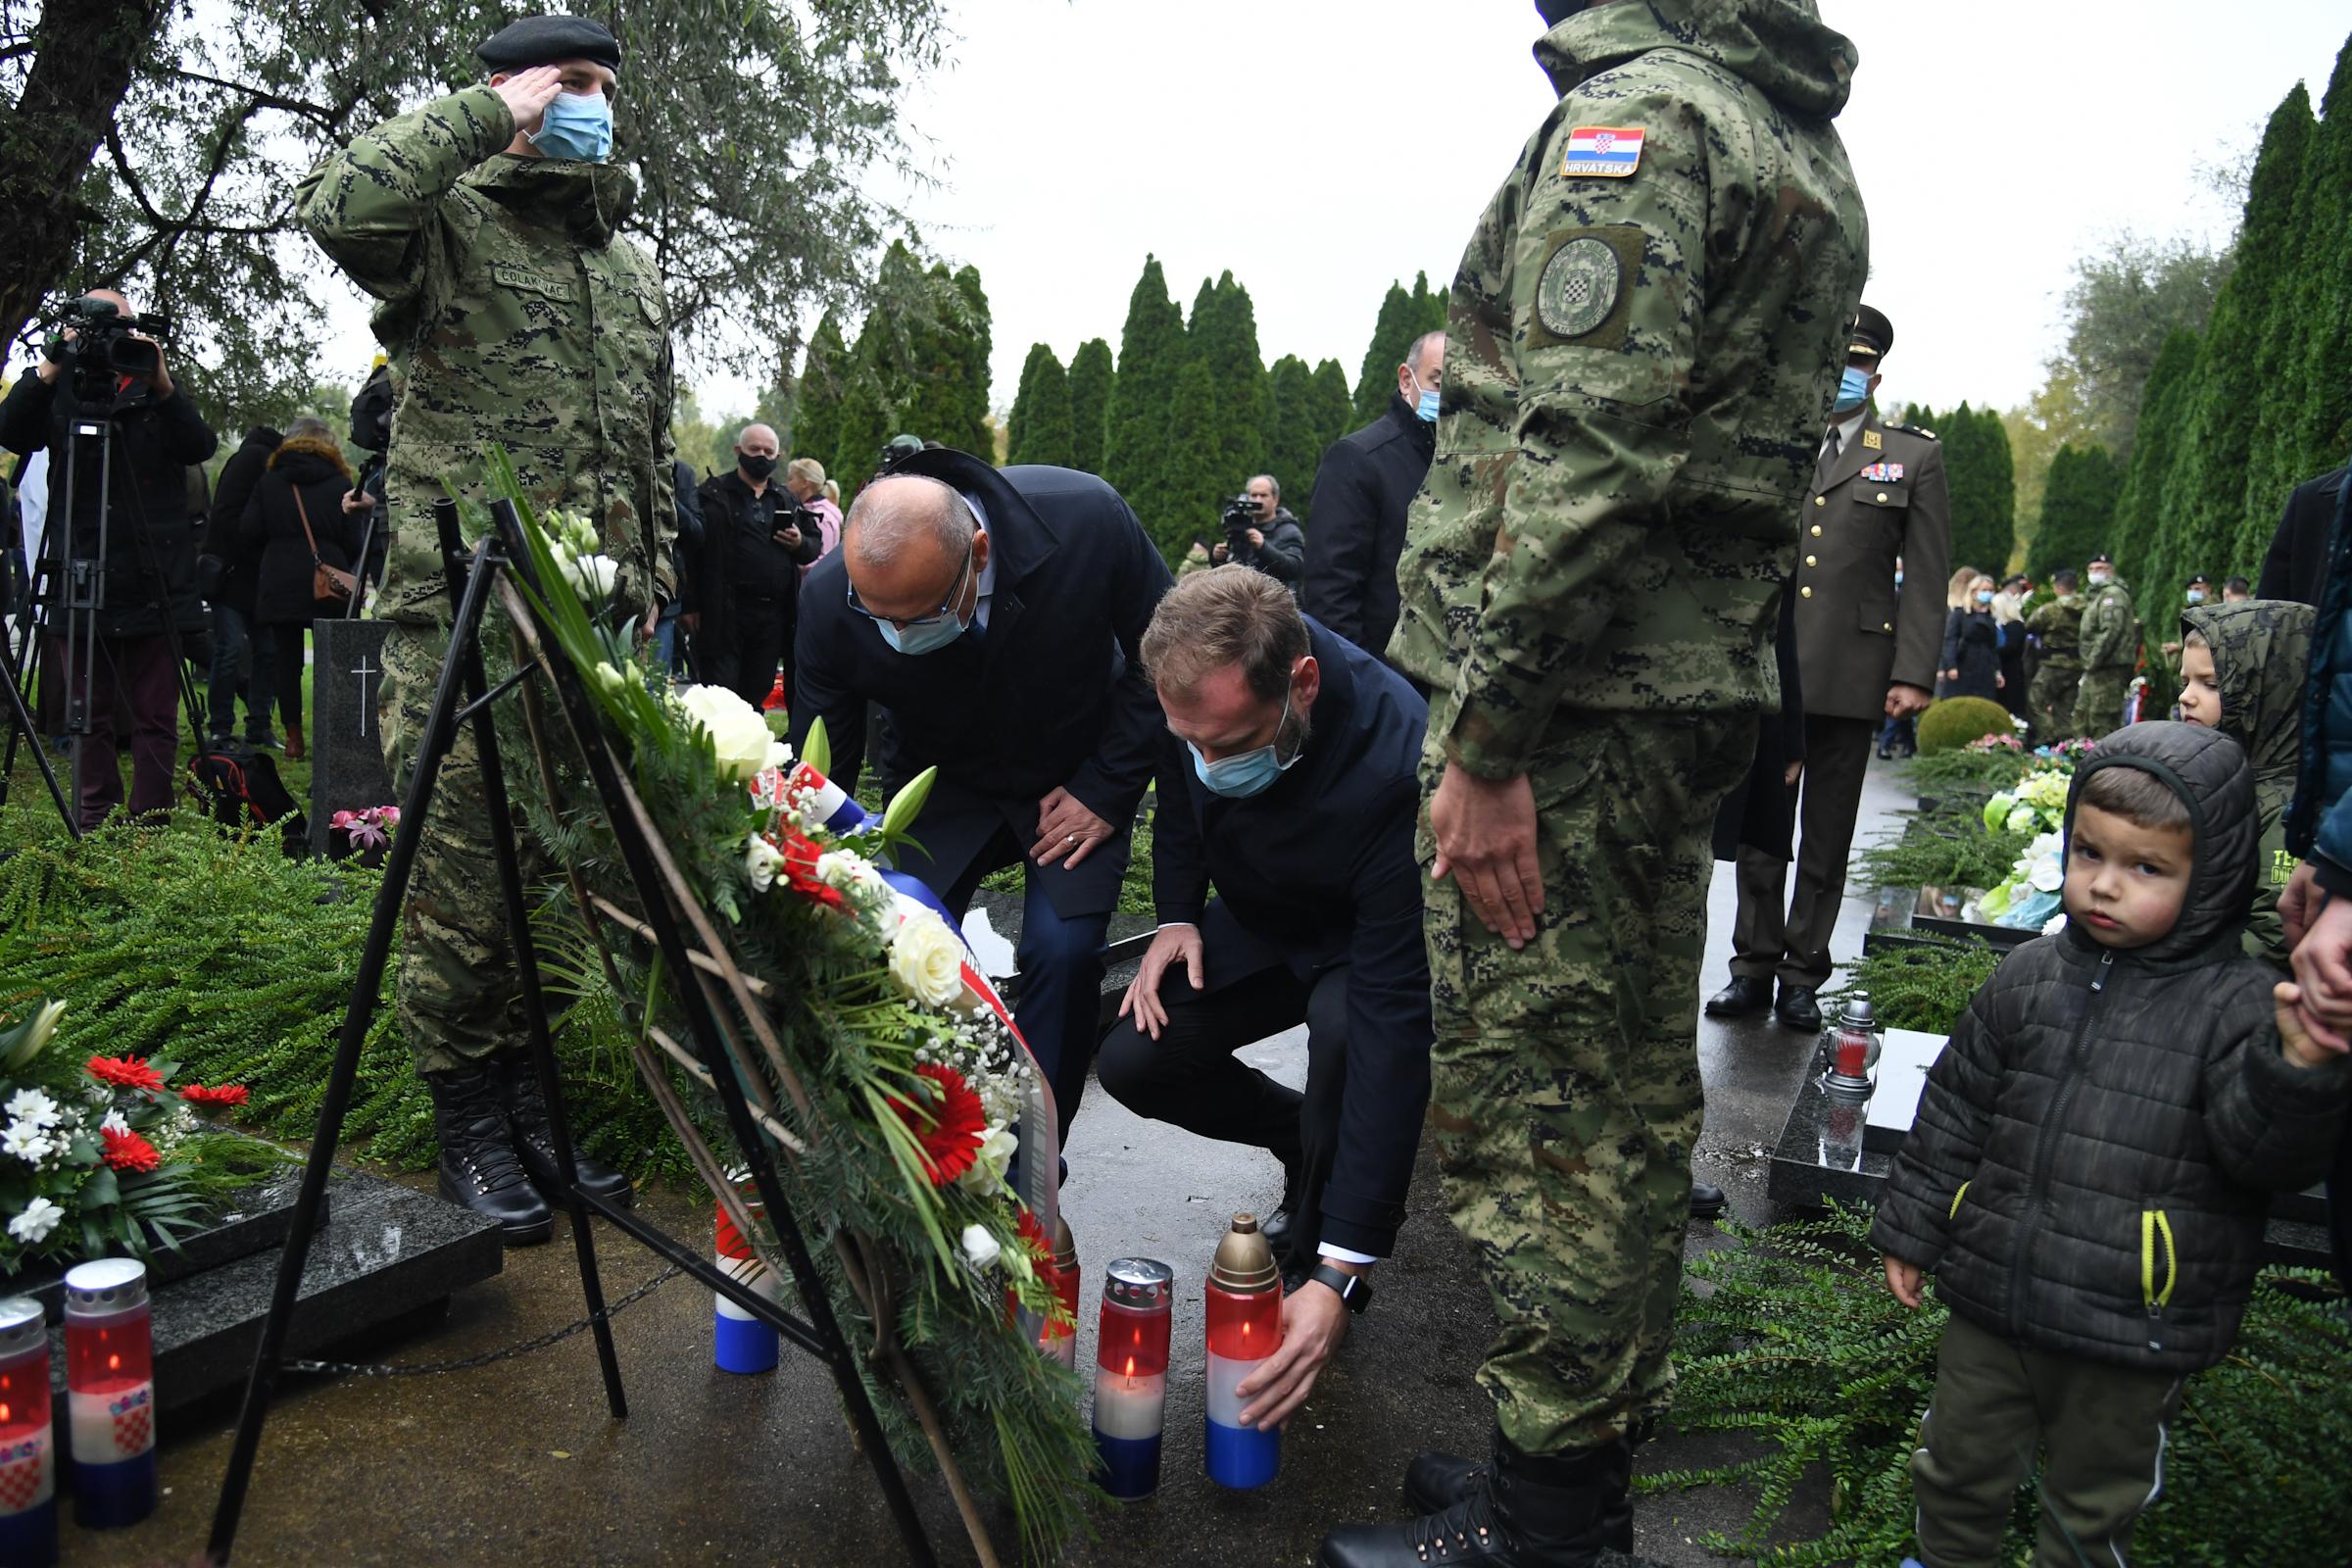 U Vukovaru obilježena 29. obljetnica pogibije generala Blage Zadre